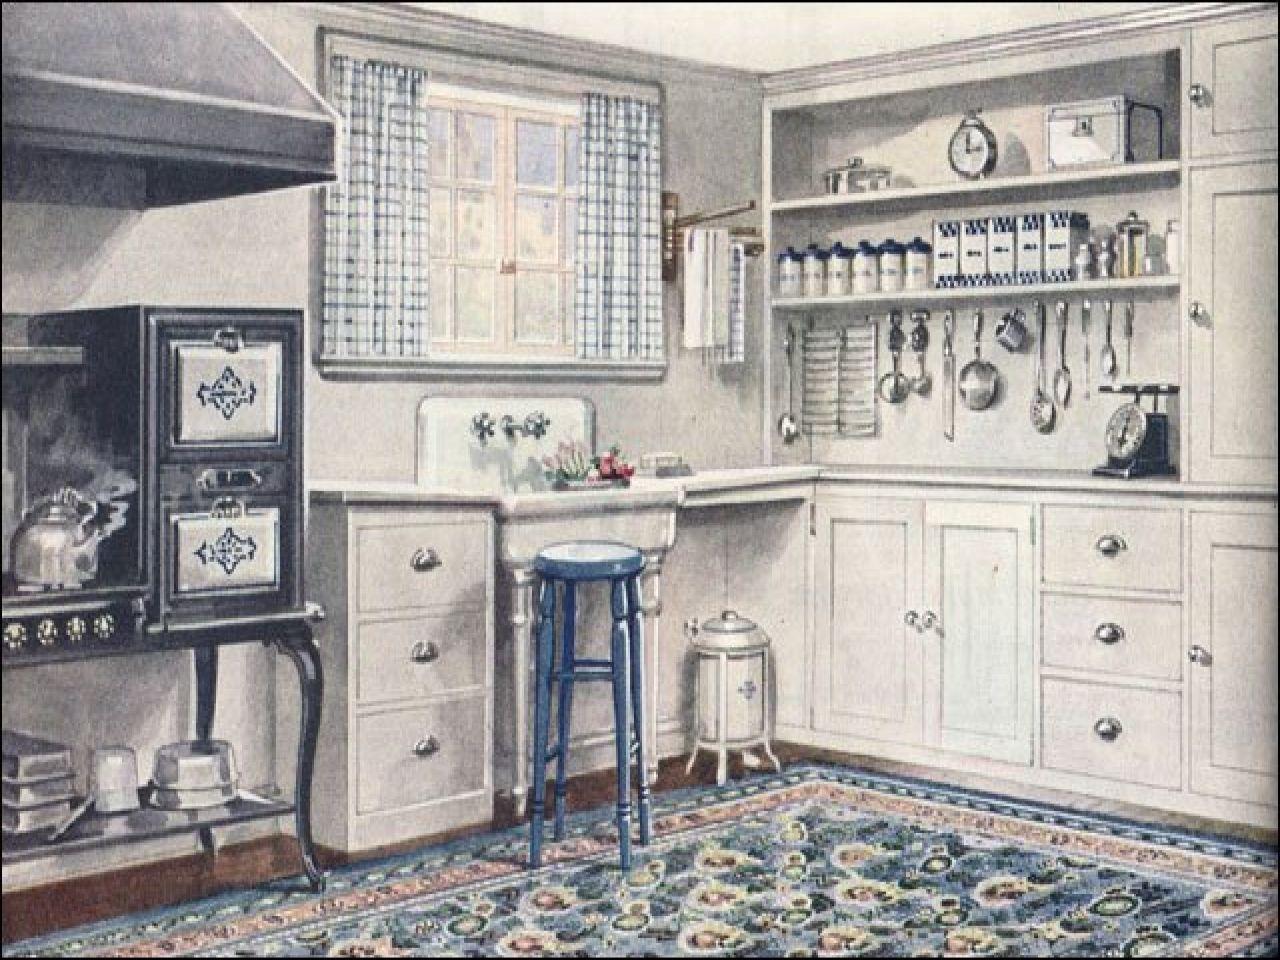 craftsman mission style kitchen cabinets 1920 s style kitchen